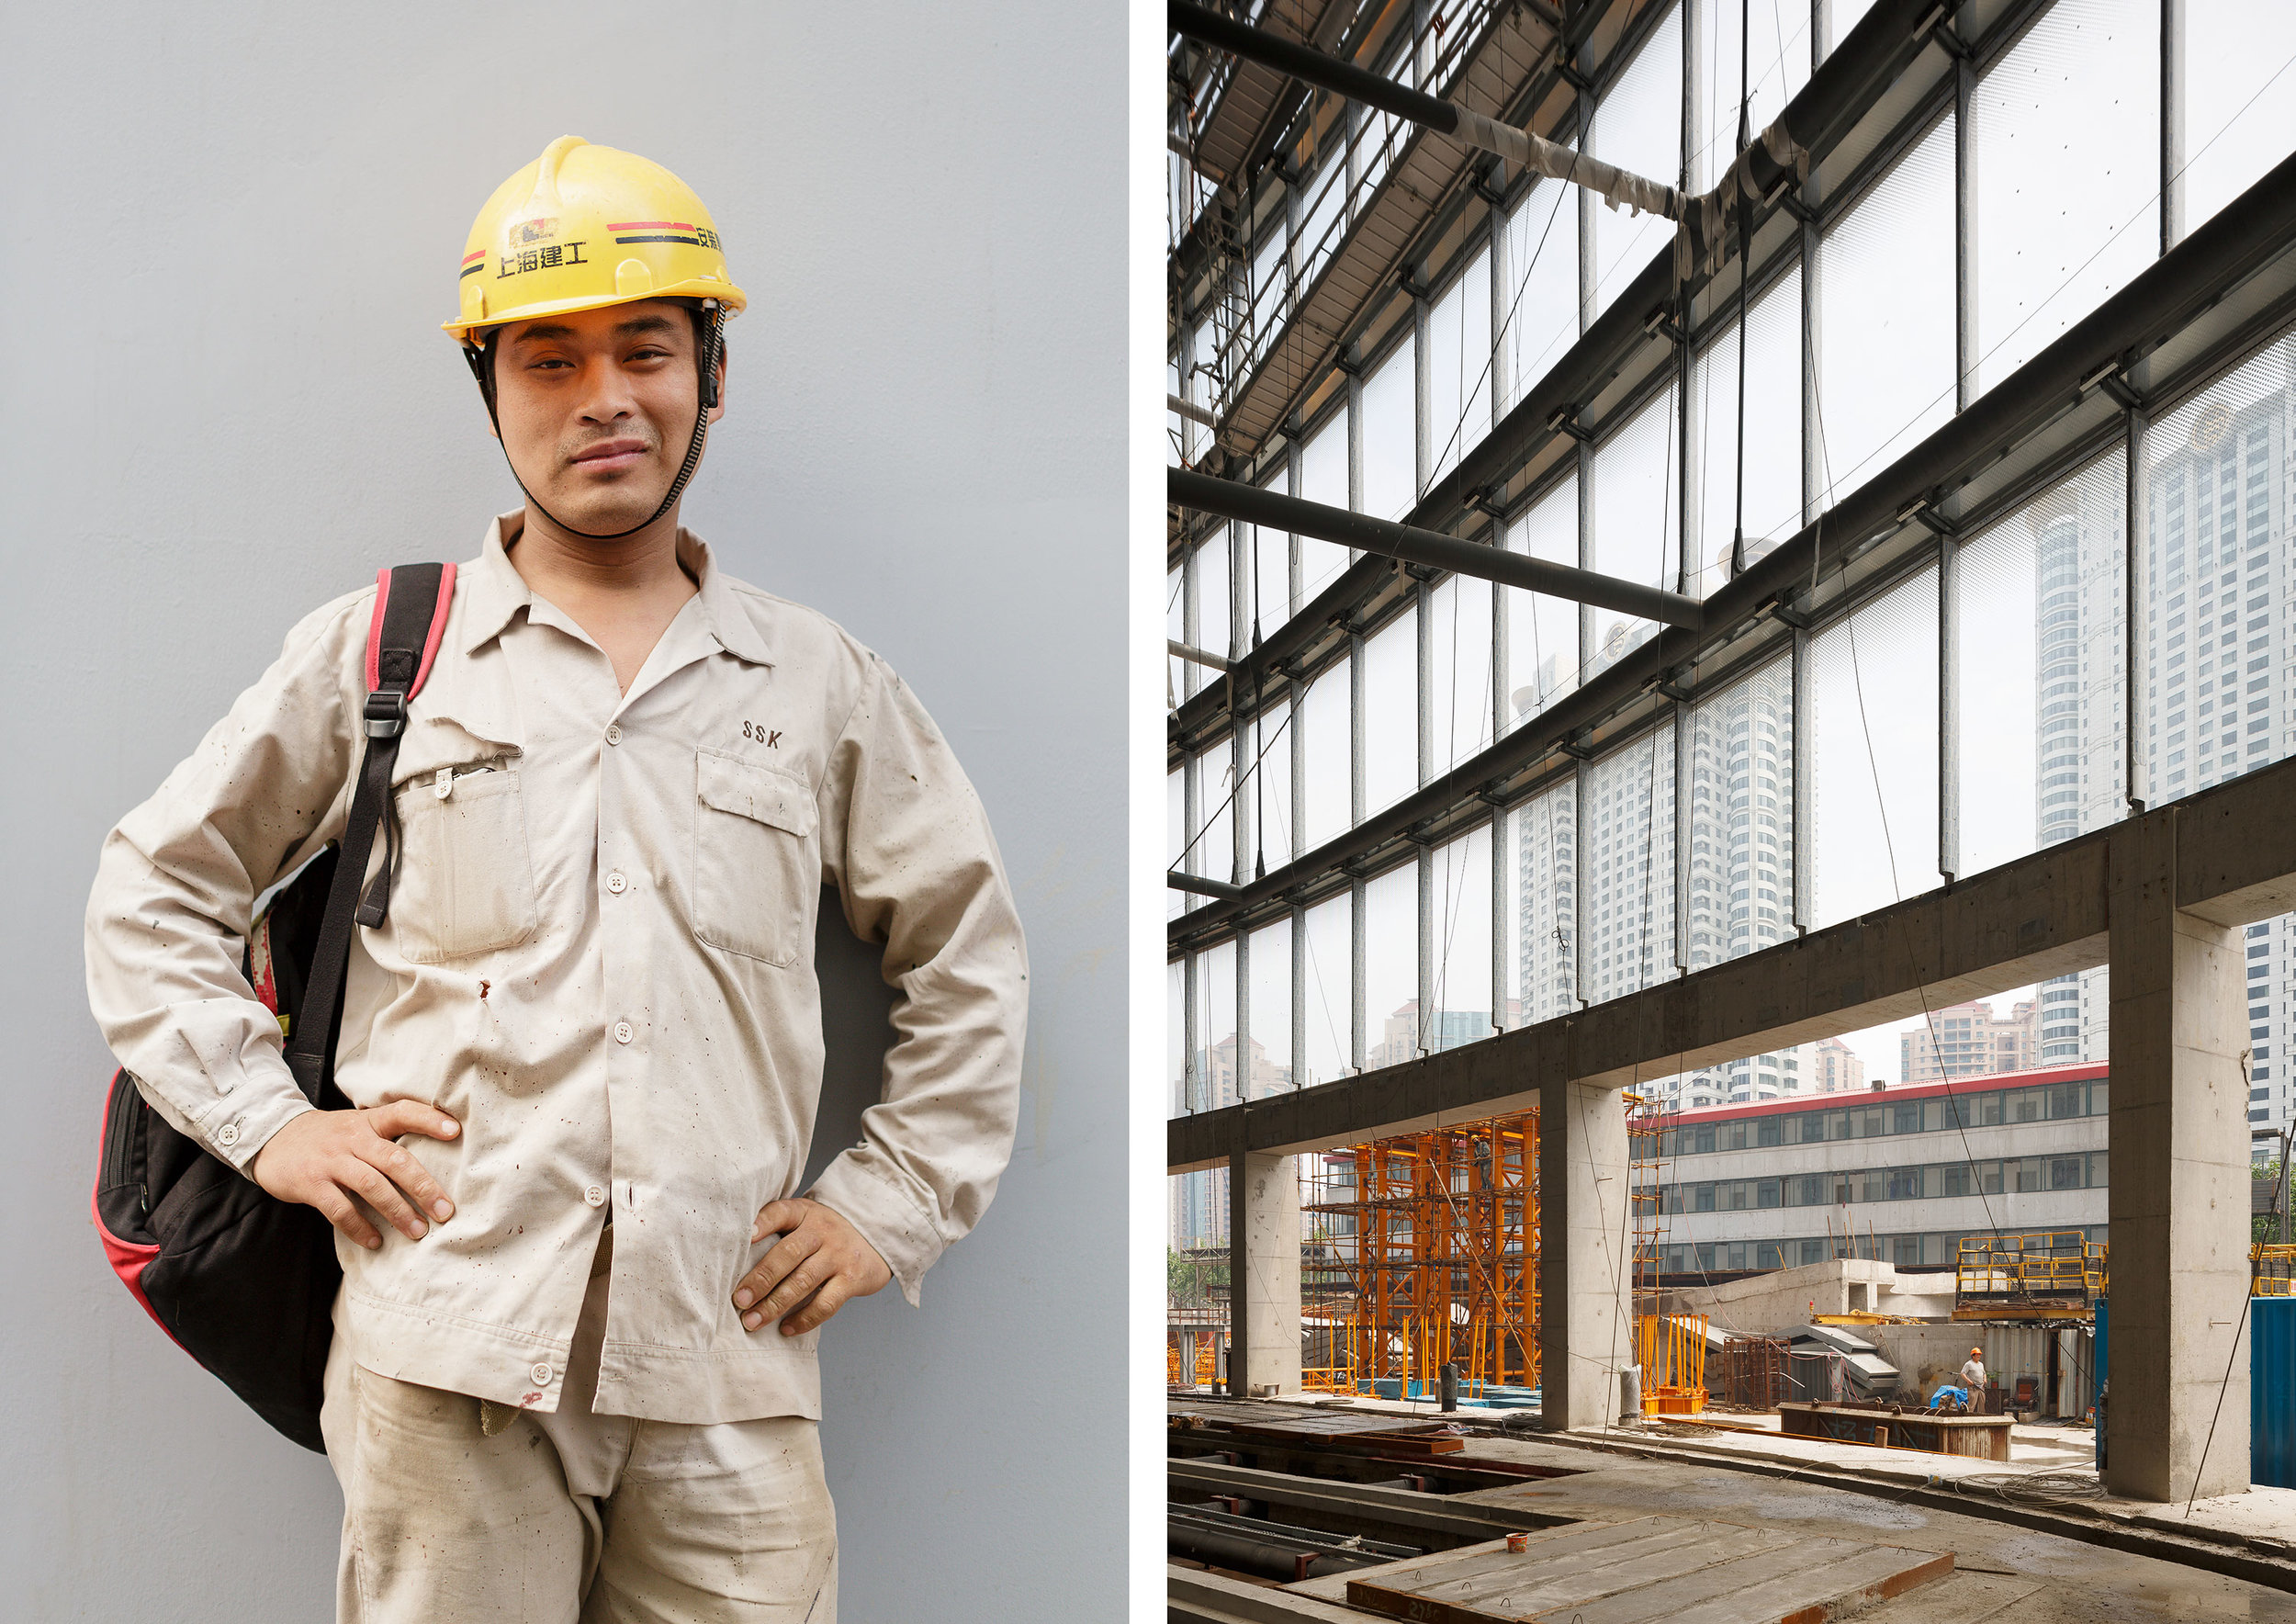 Shanghai_Tower-workers-and-building17.jpg